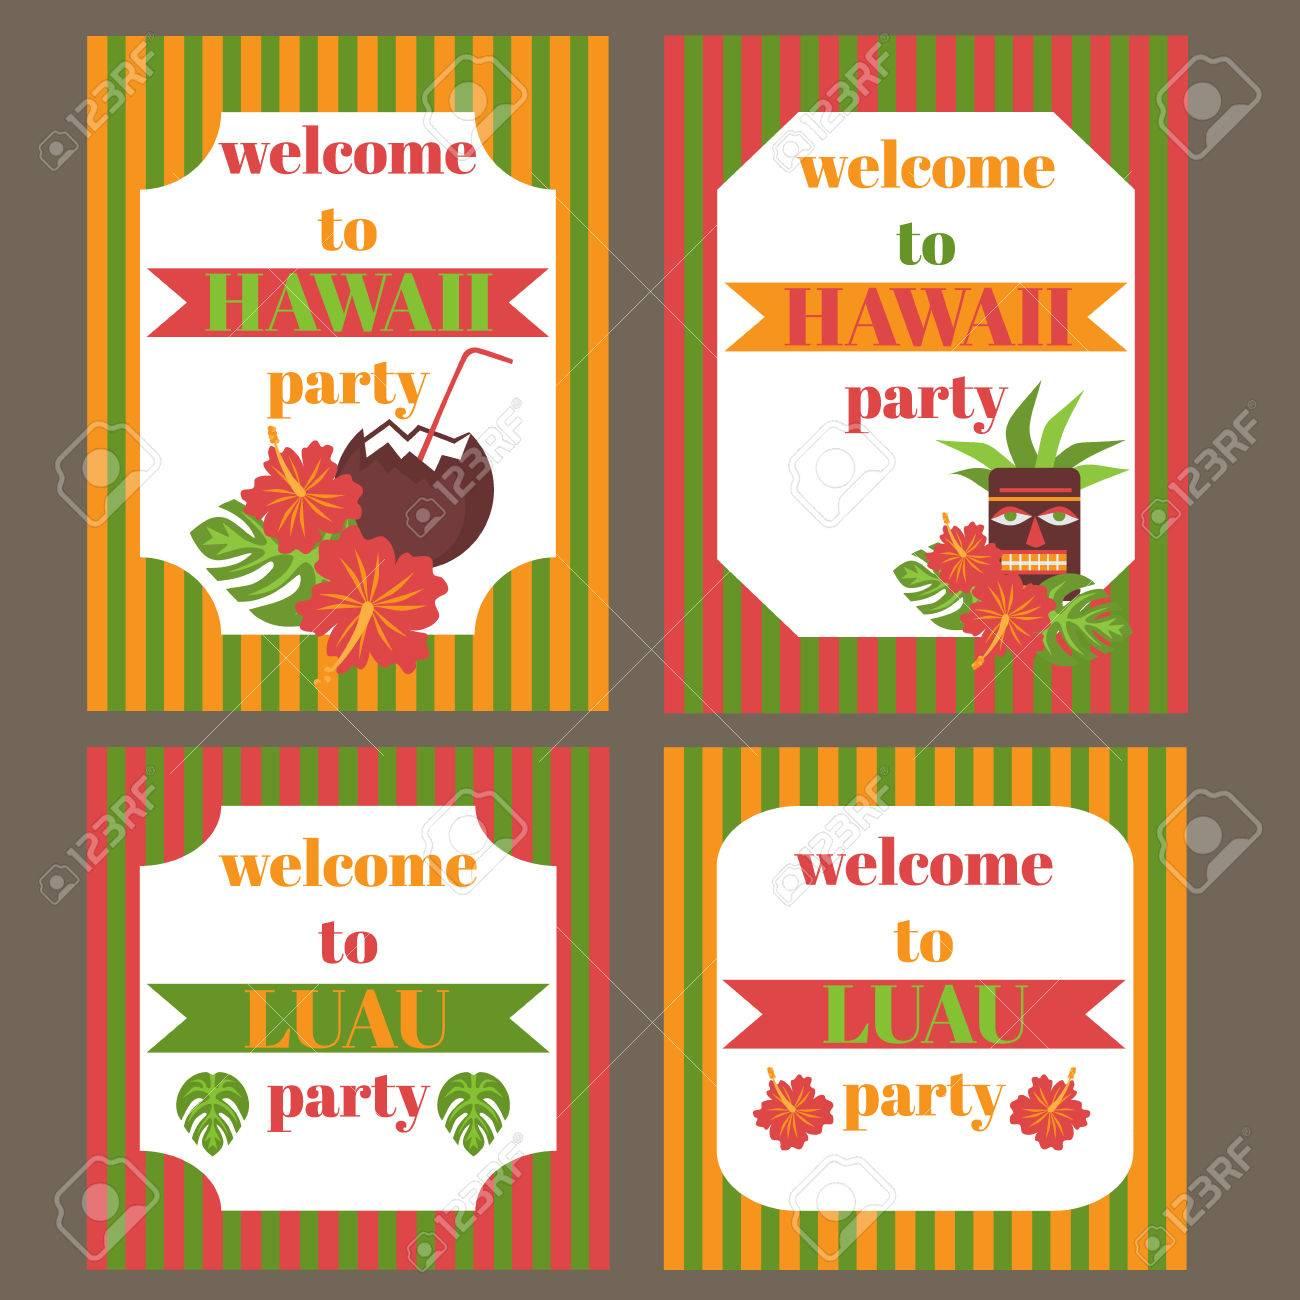 printable set of hawaii party elements template luau invitation